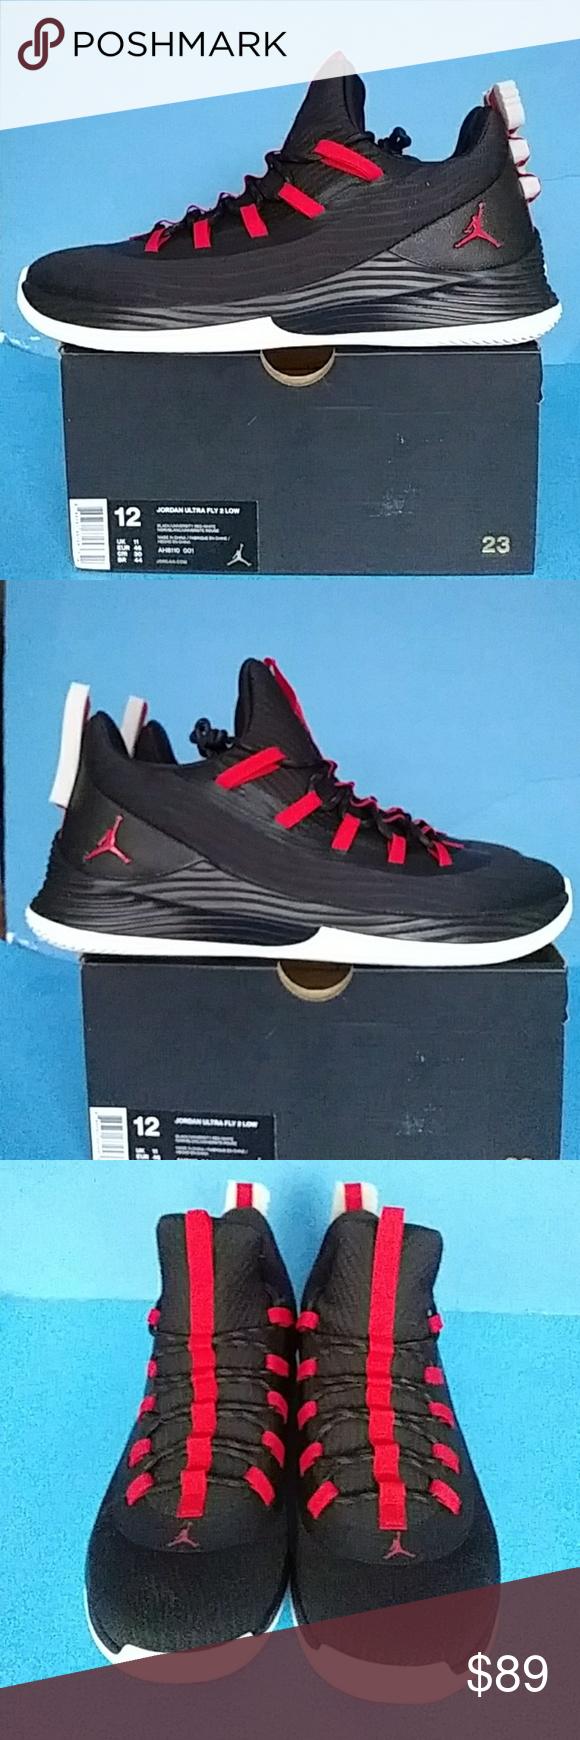 1a1ee41f4481 Basketball Sneakers · Nike Tennis · BRAND NEW AIR JORDAN ULTRA FLY 2 LOW  100 % AUTHENTIC.  5625 AIR JORDAN